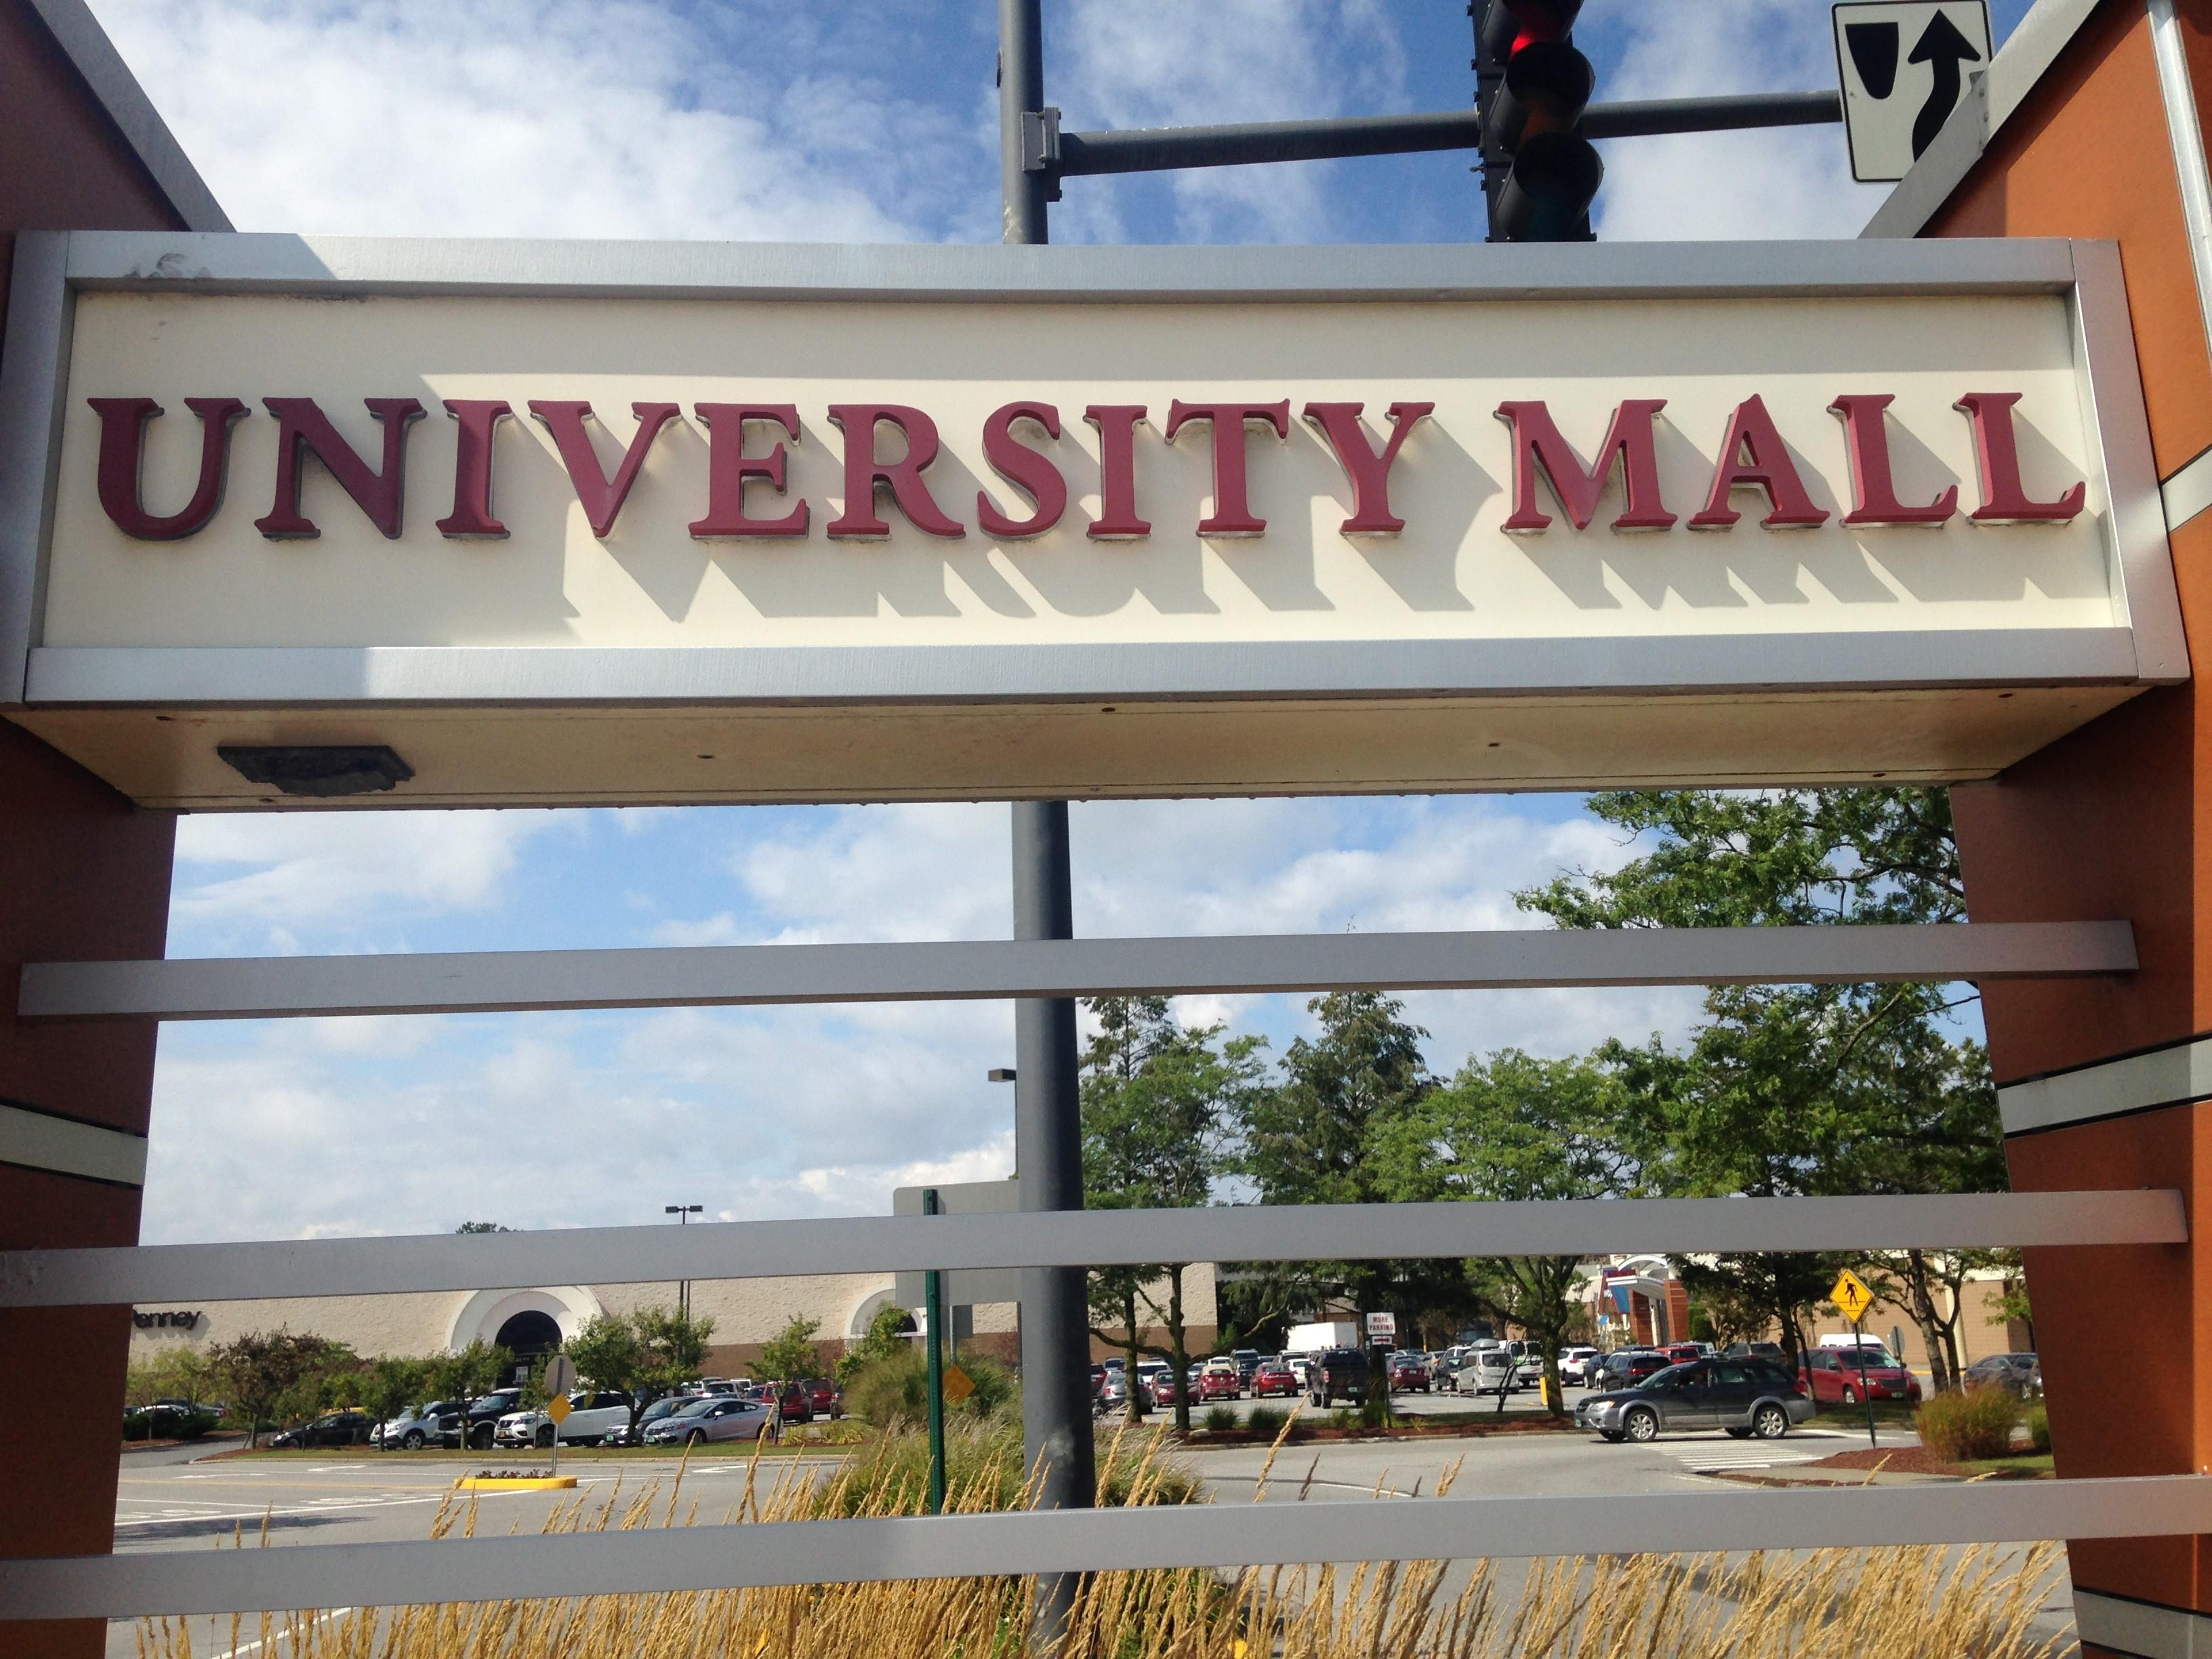 University mall vt coupons